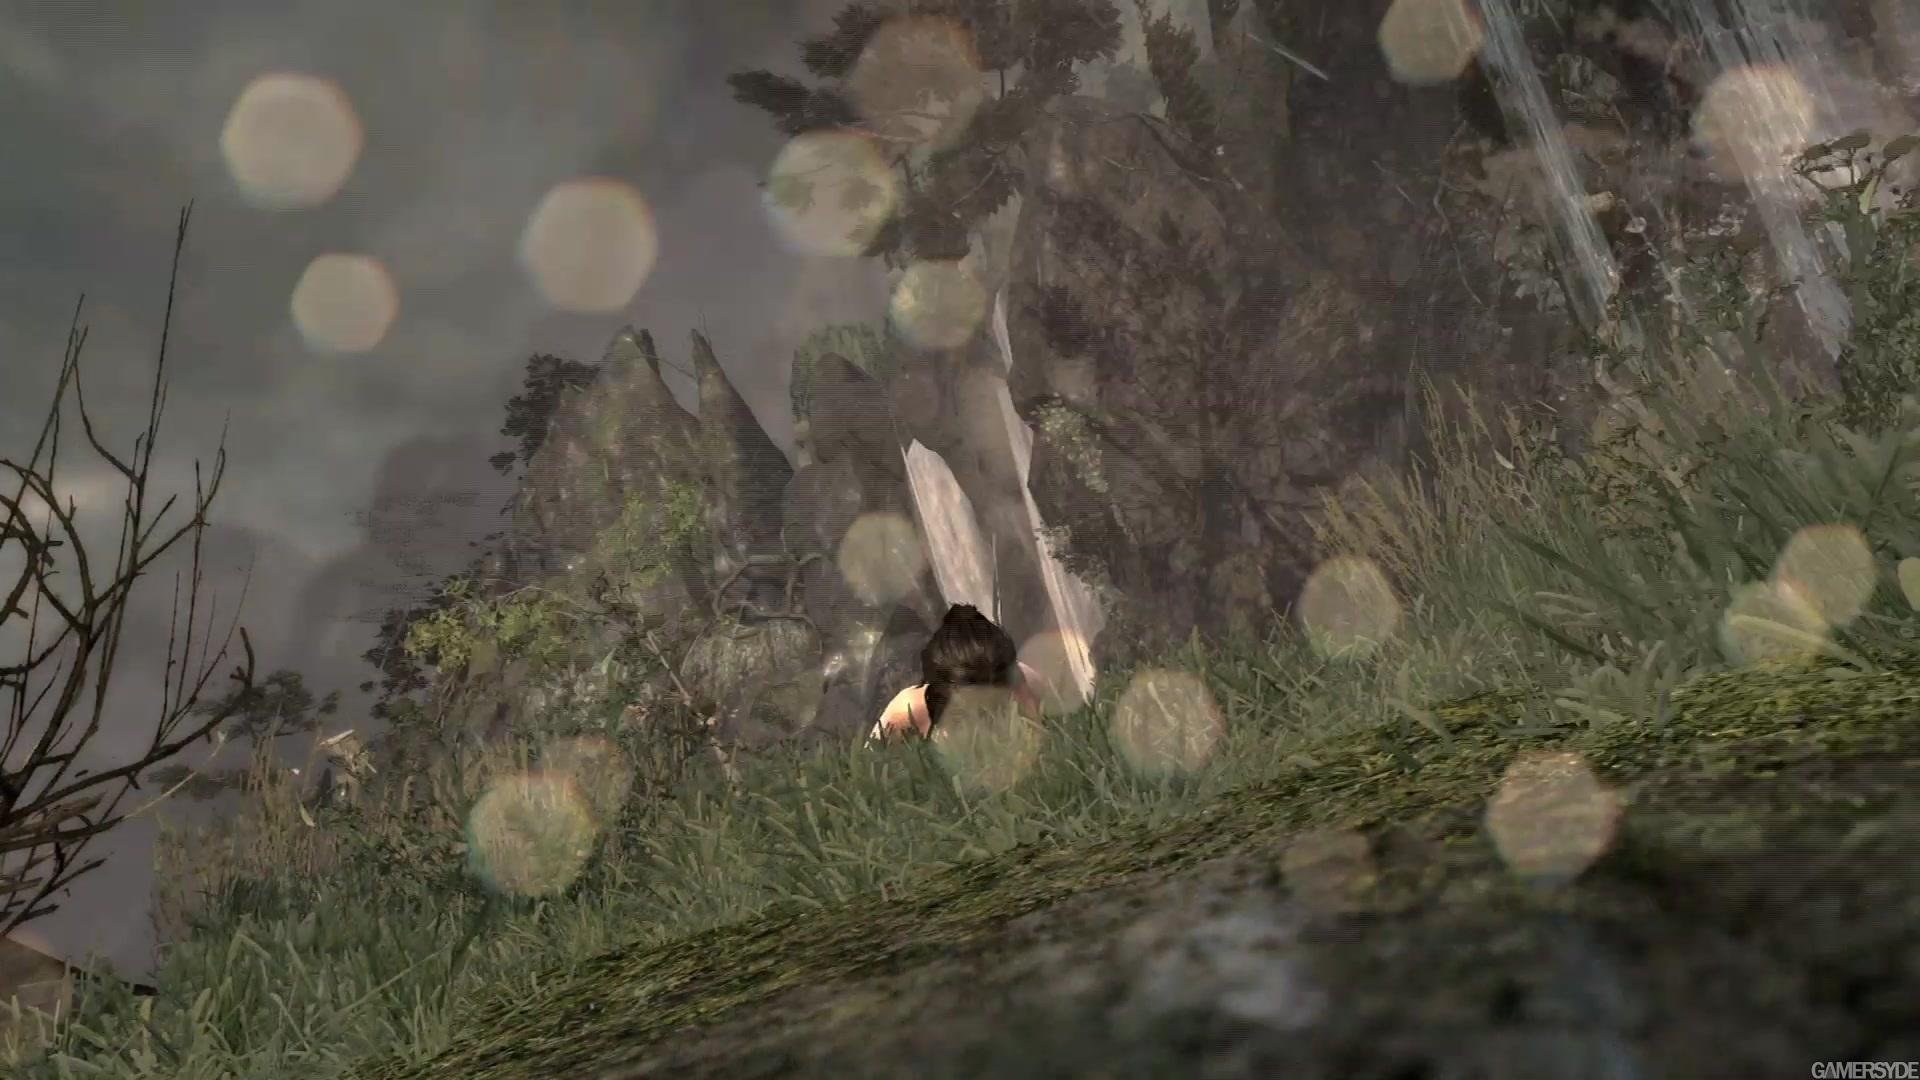 image tomb raider 24052 1912 0005 تصاویر جدیدی از عنوان Tomb Raider: Definitive Edition منتشر شد